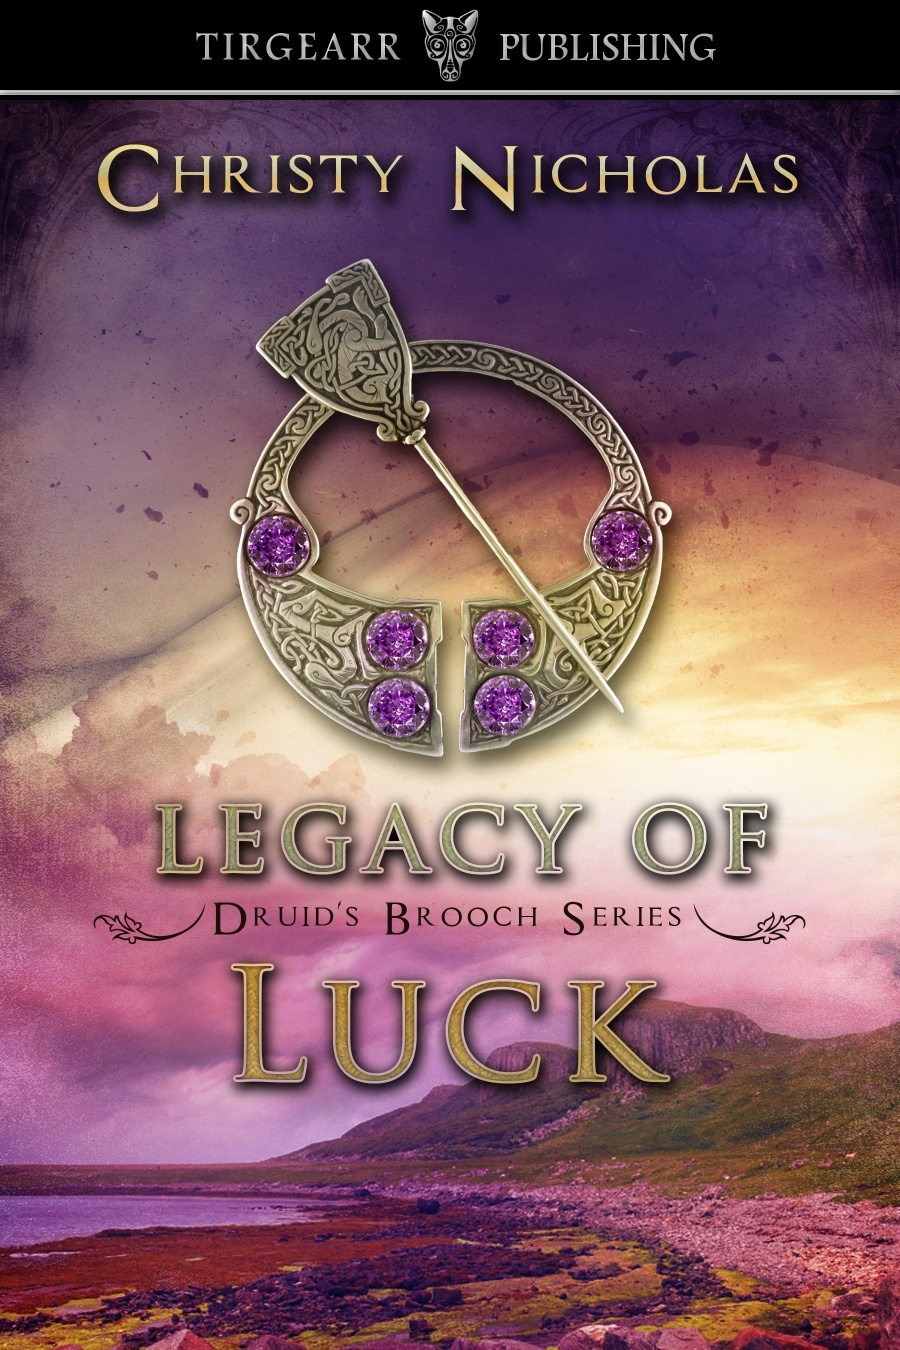 mediakit_bookcover_legacyofluck